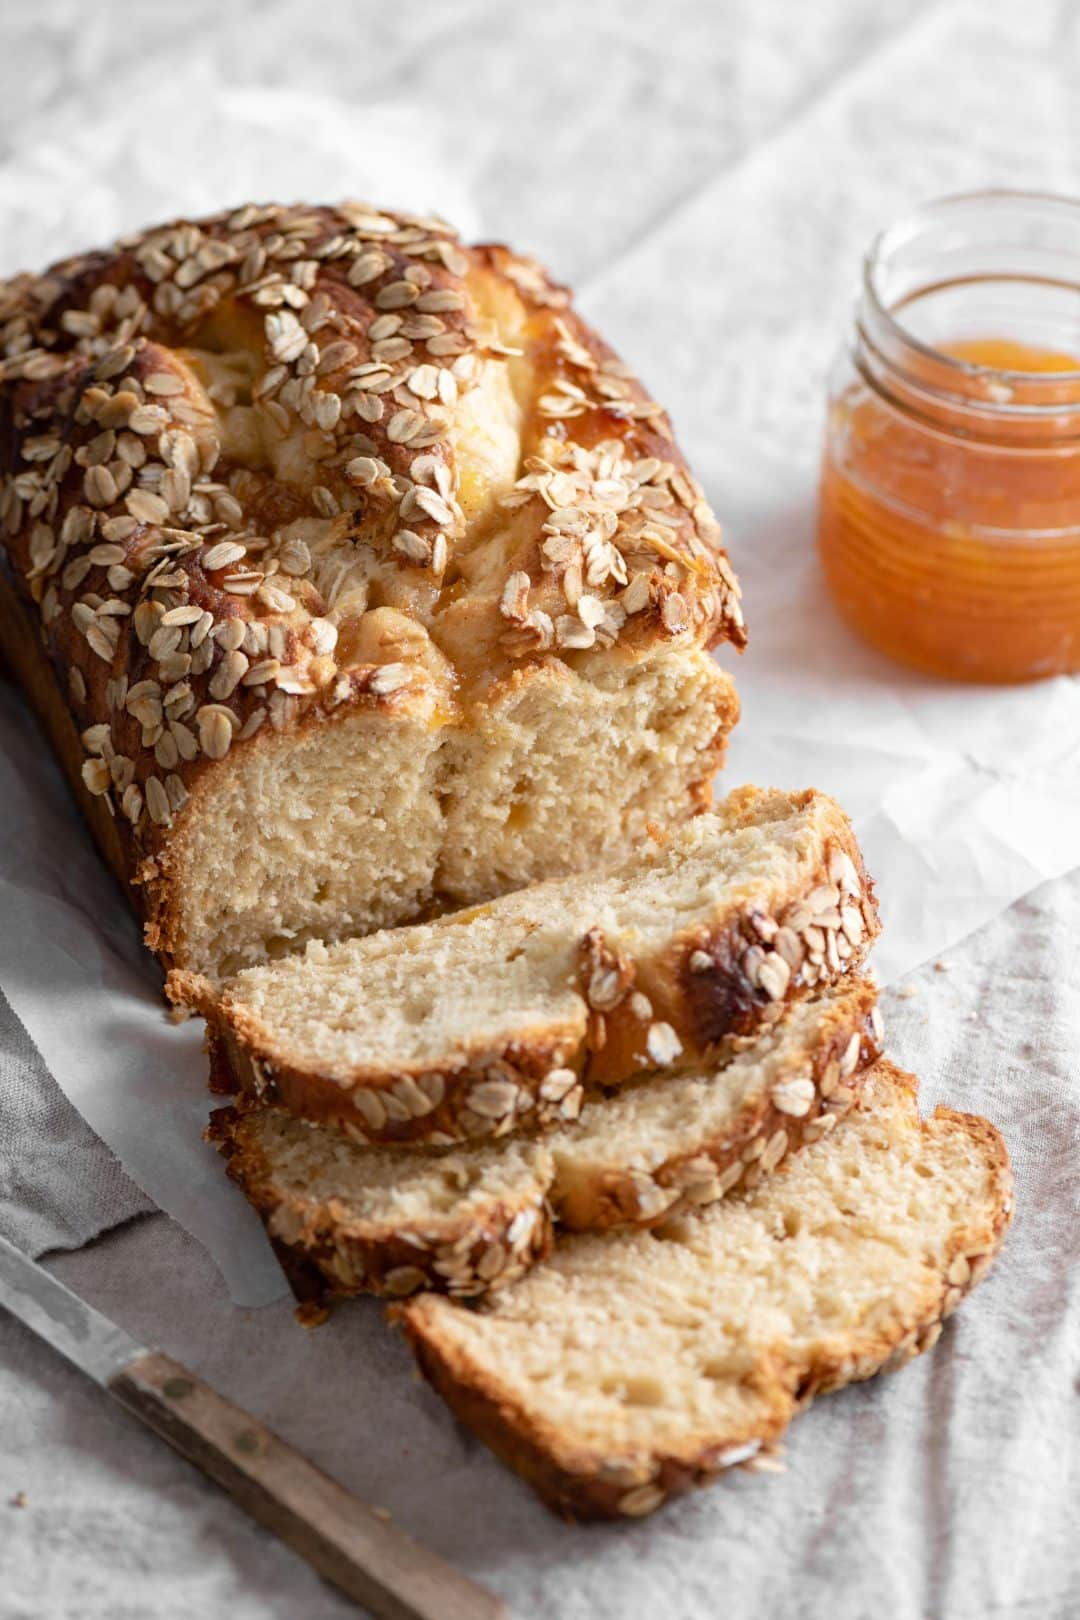 Brioche Bread Recipe with oat topping and peach preserves